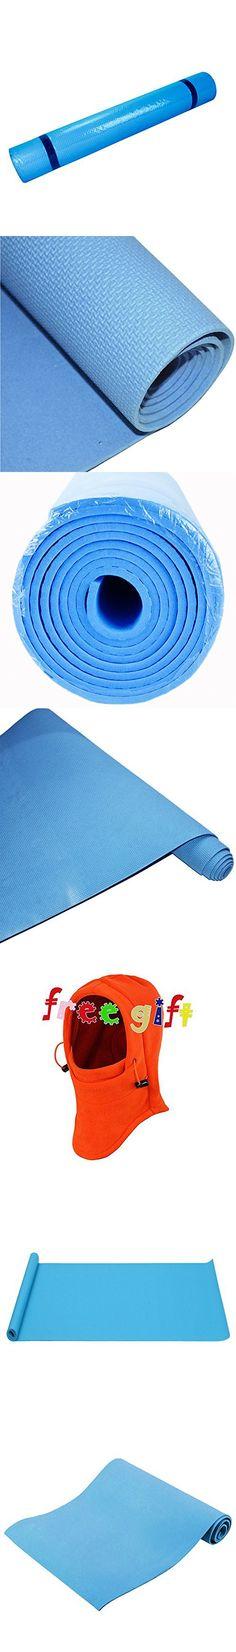 Ezyoutdoor Eva Foam Sleeping Pads Pilates Yoga Mat Pad Cushion Exercise Mattress Floor mat Blanket for Picnic C&ing Beach Tent 180 x  sc 1 st  Pinterest & Ezyoutdoor Pilates Yoga Mat Pad Cushion Exercise Mattress Floor ...